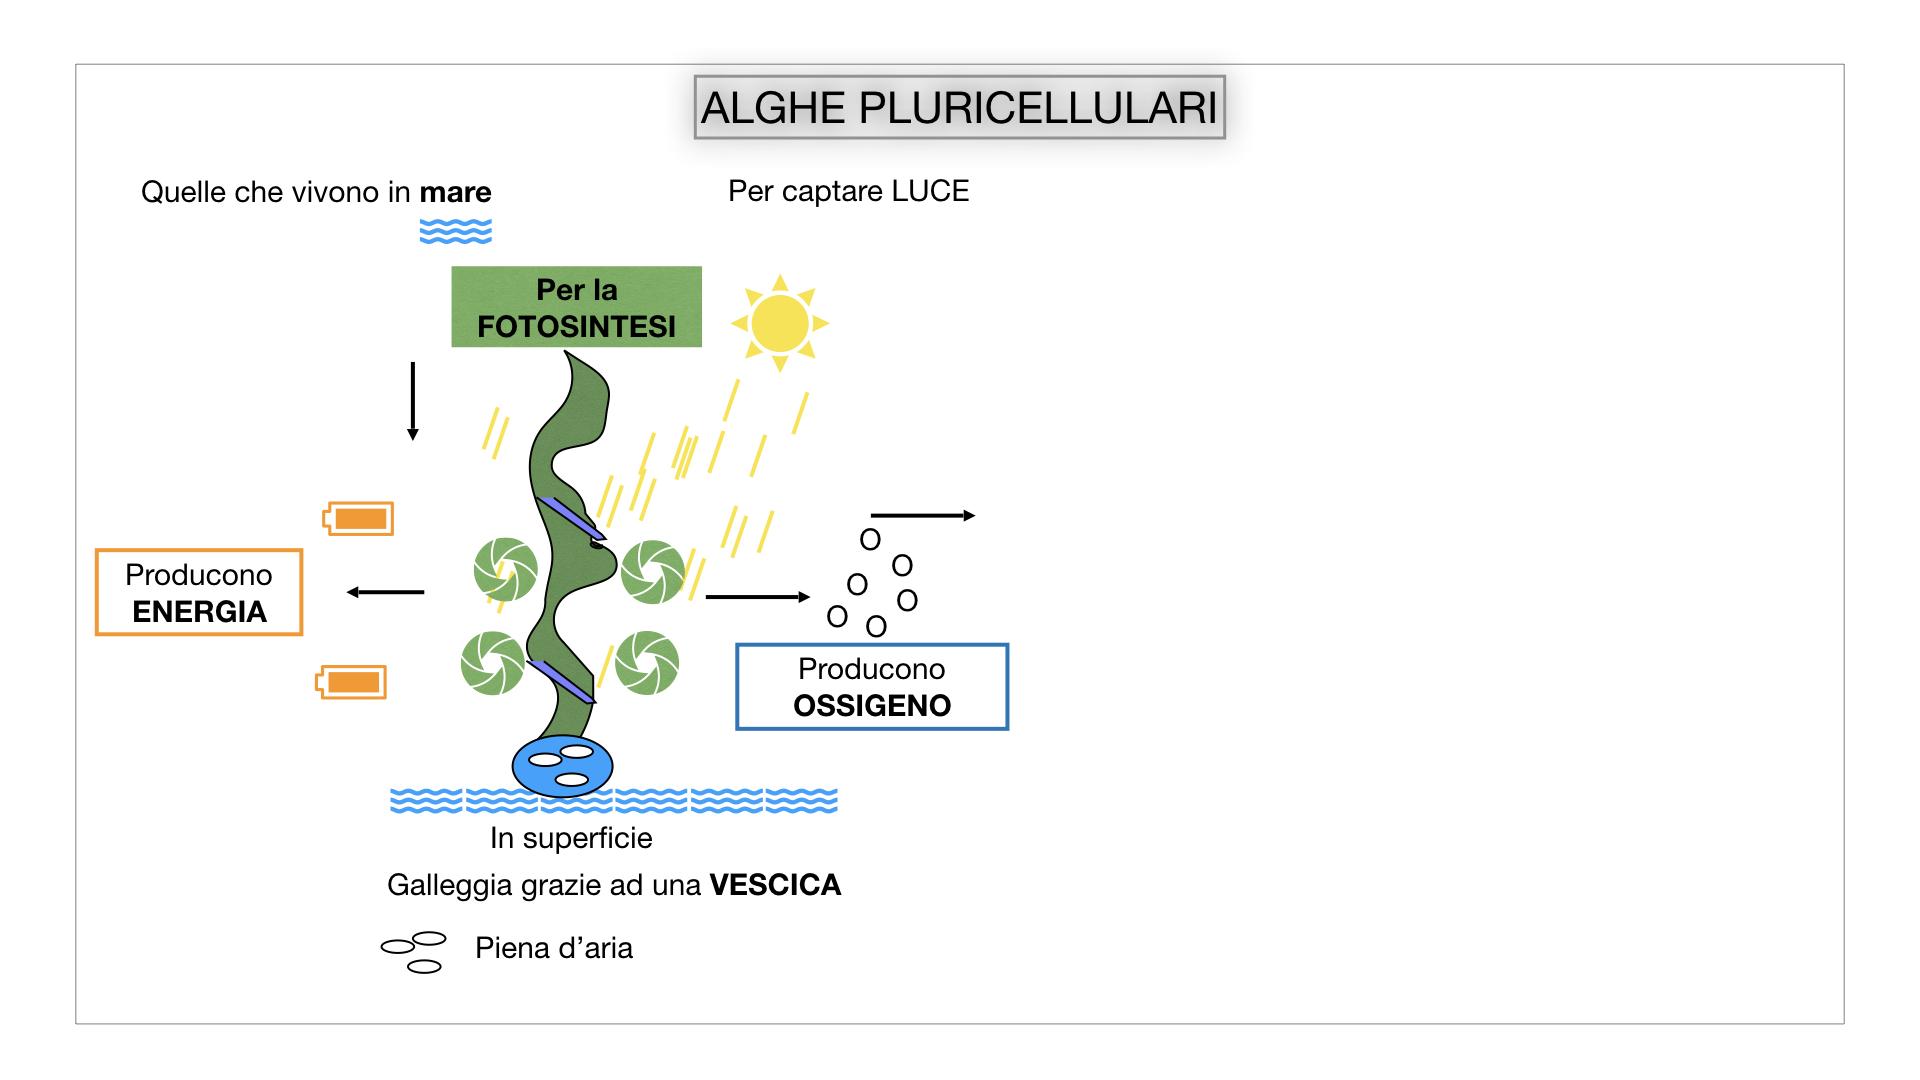 8. alghe uni_pluri_cellulari_SIMULAZIONE.038